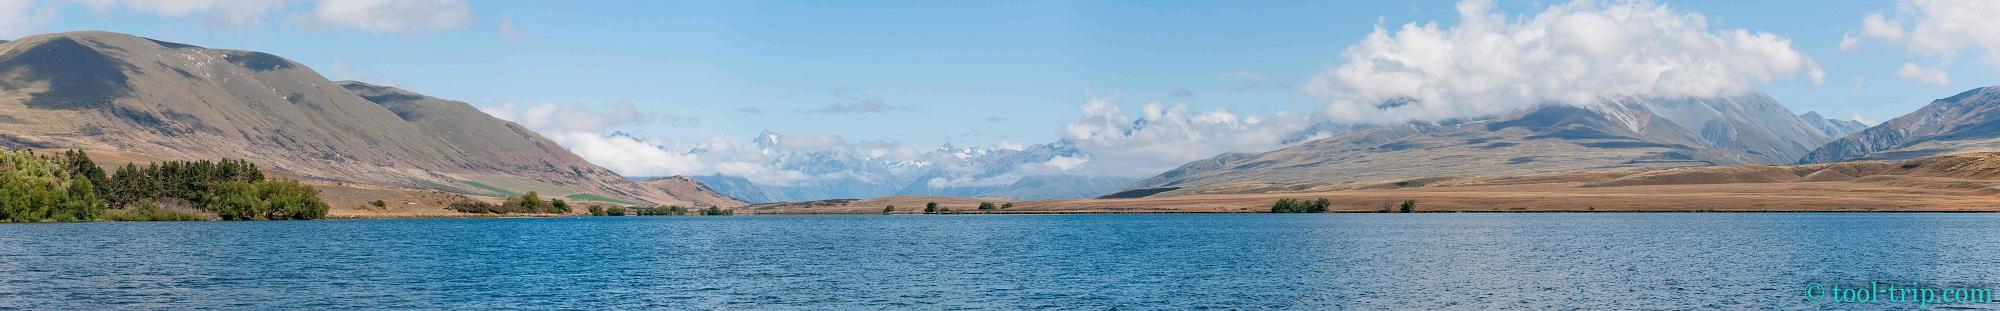 mount sunday lake pano